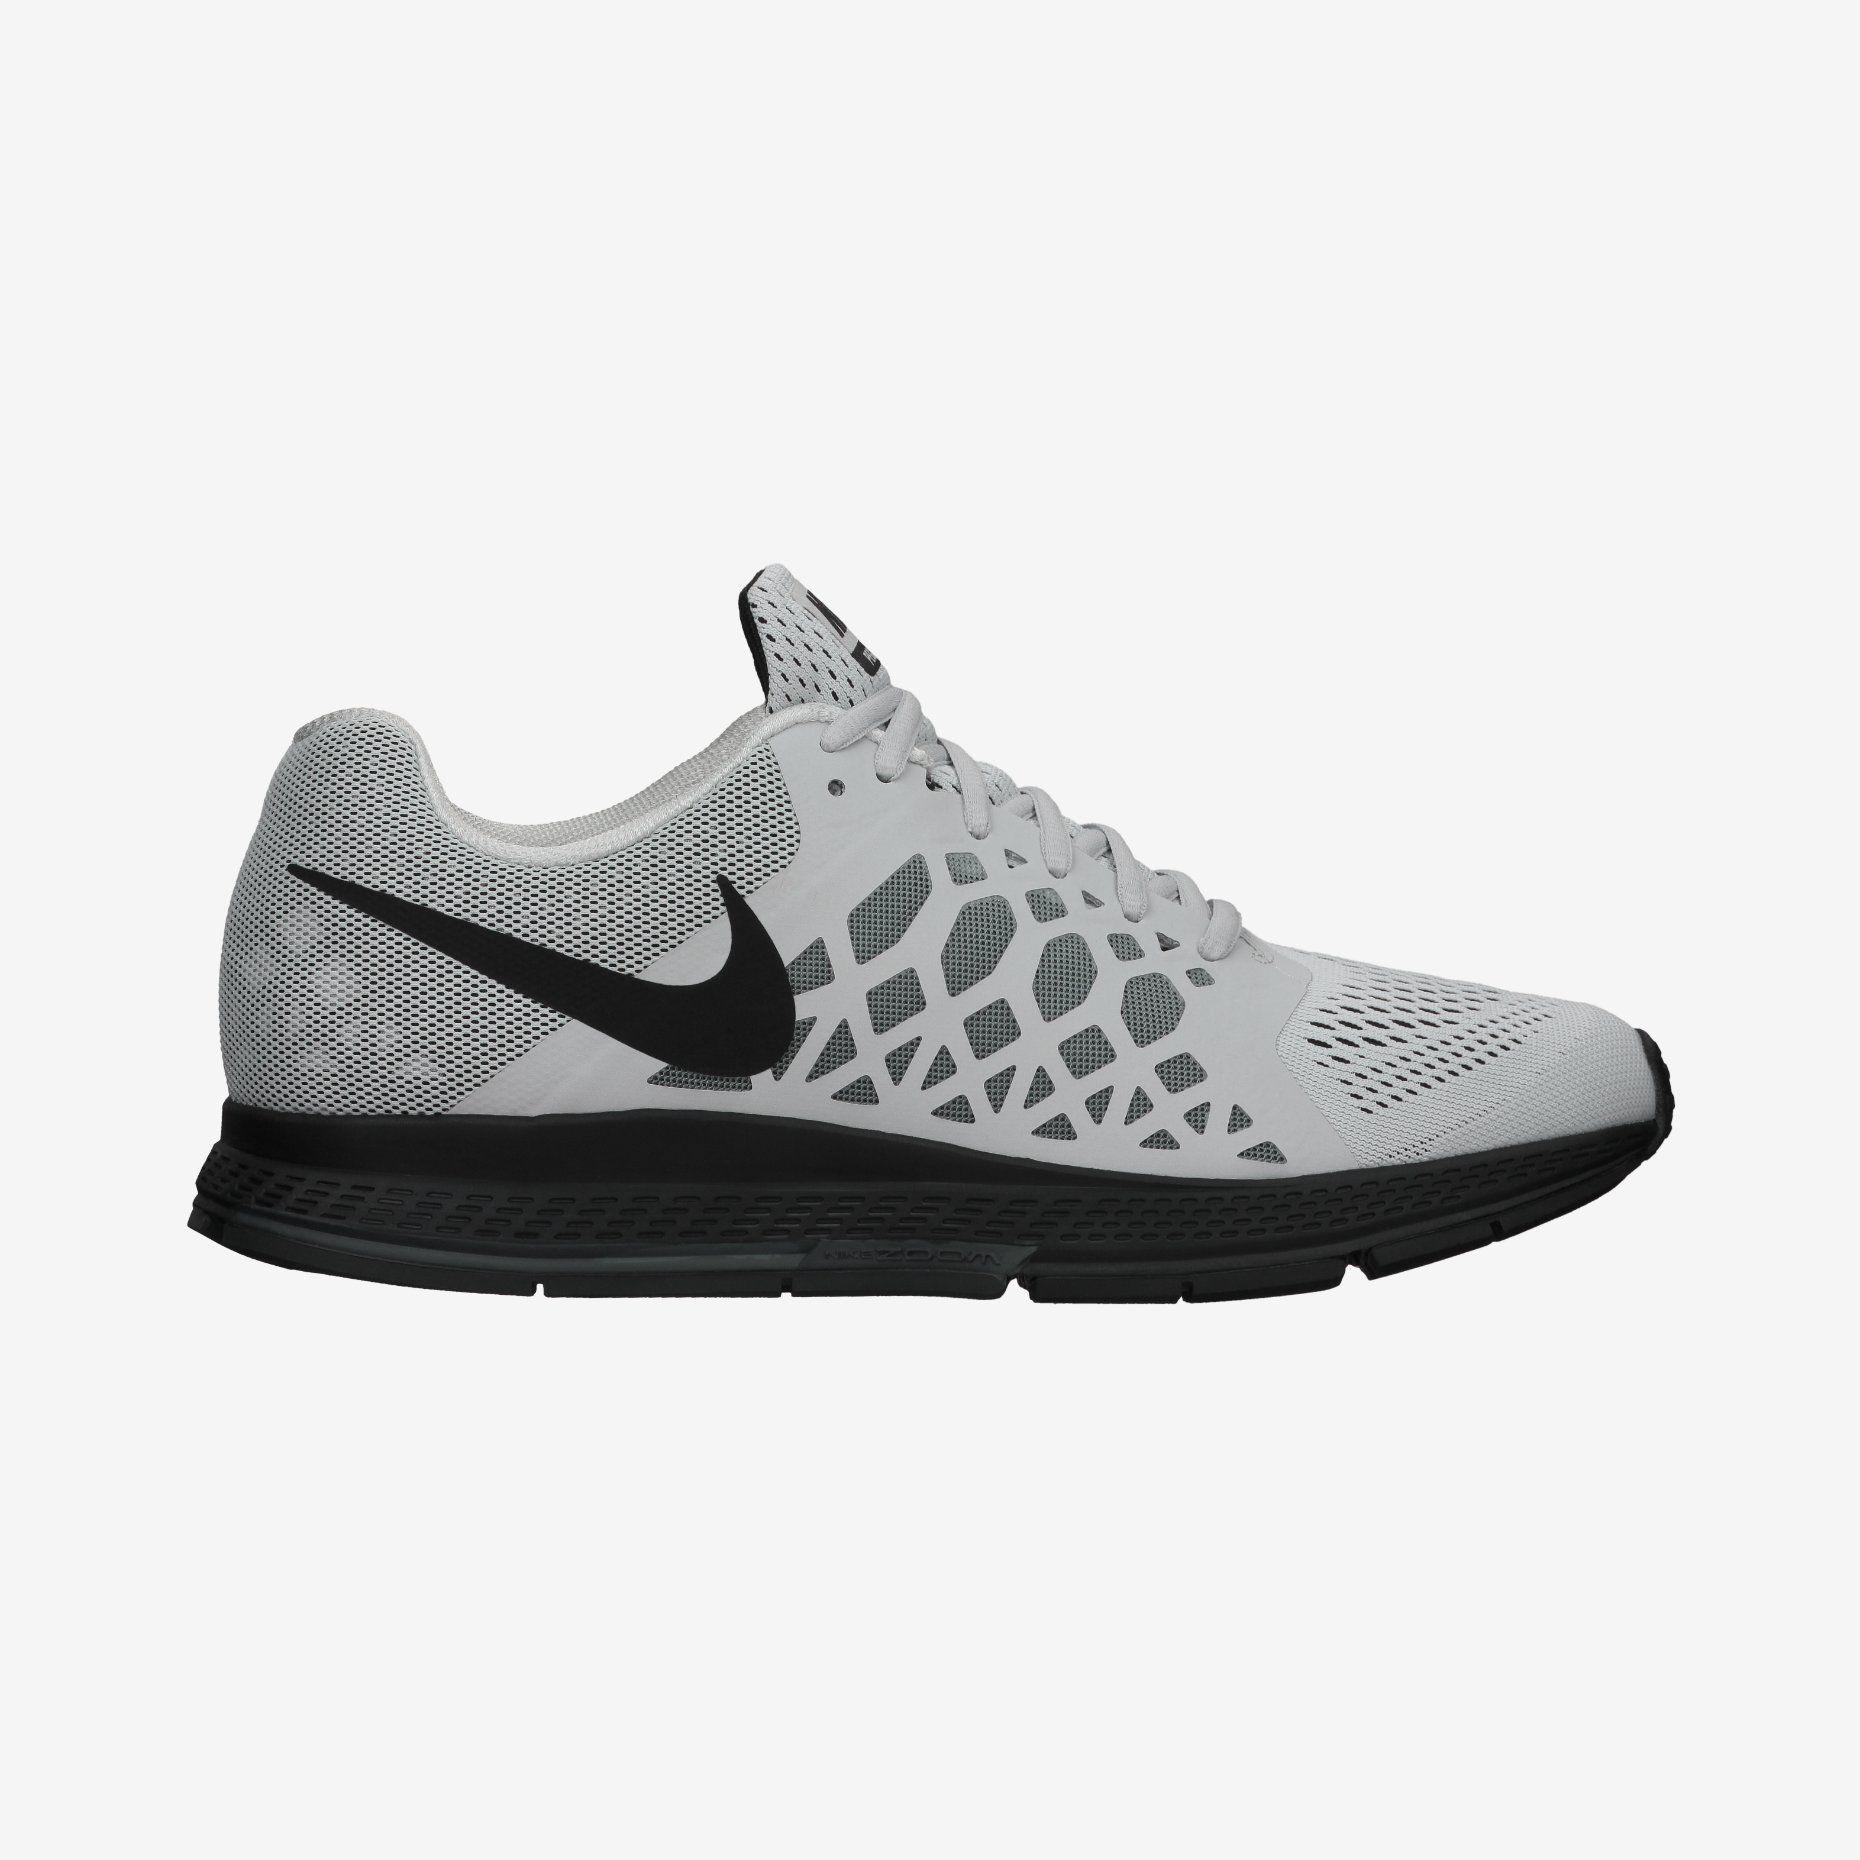 sale retailer 30c25 41dac Nike Air Zoom Pegasus 31 Men s Running Shoe. Nike Store UK. Find this Pin and  more ...